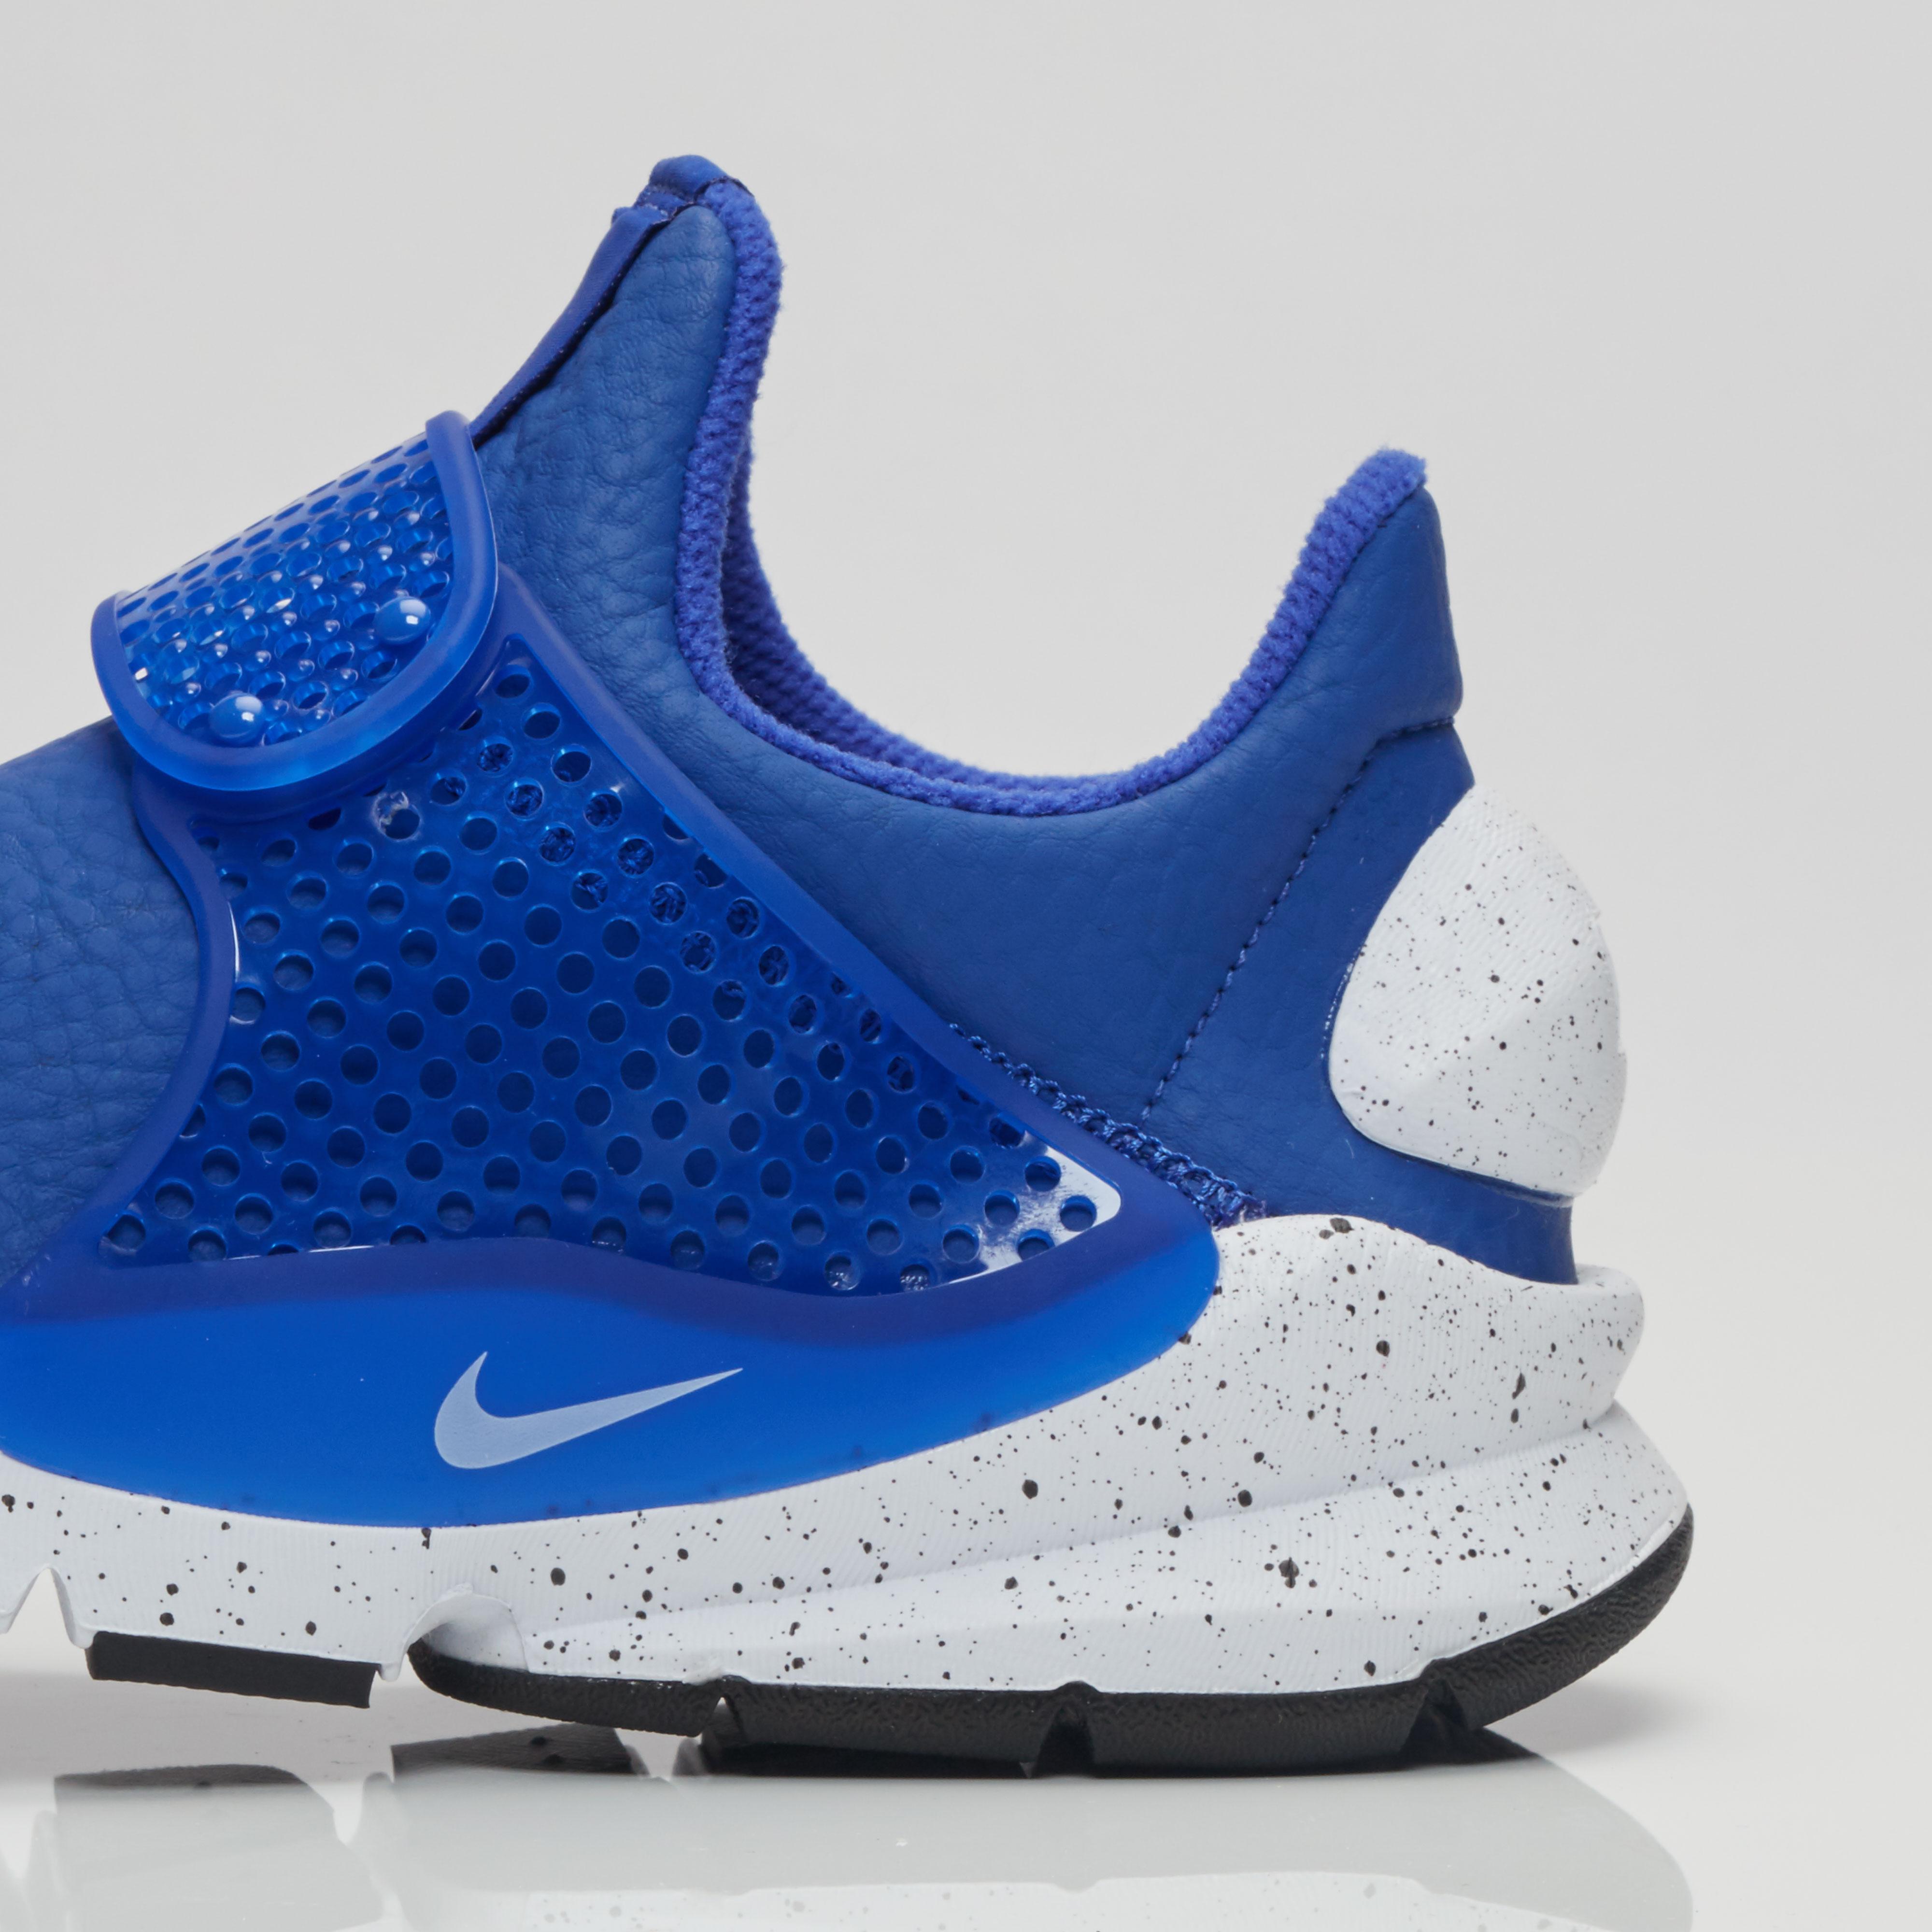 new arrival cf900 ea28c Nike Sock Dart Premium - 881186-400 - Sneakersnstuff   sneakers    streetwear online since 1999